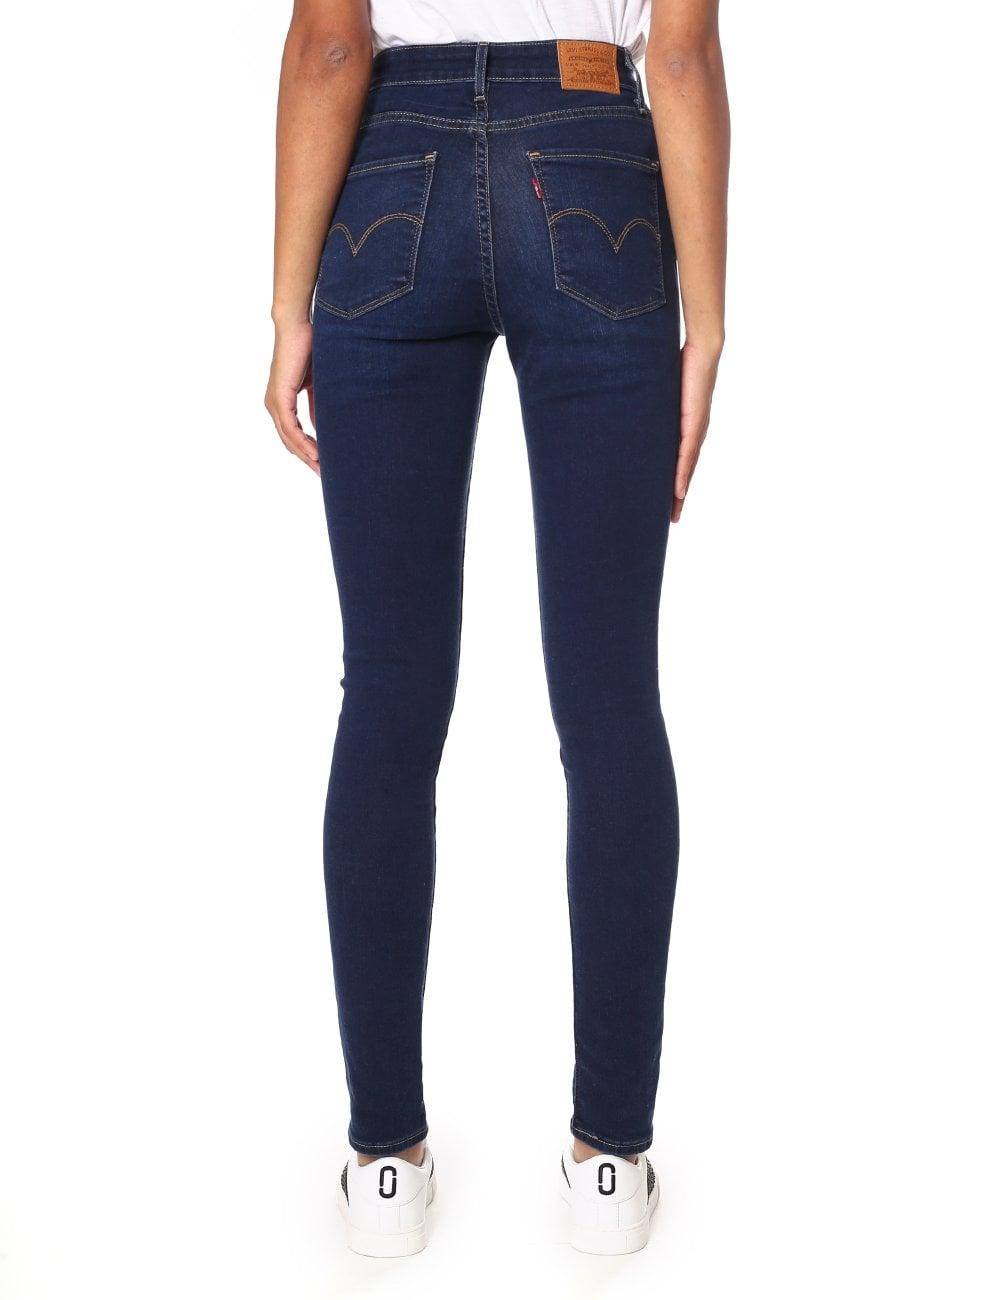 8ac3442d5a Levi's Women's 721 High Rise Skinny Jean